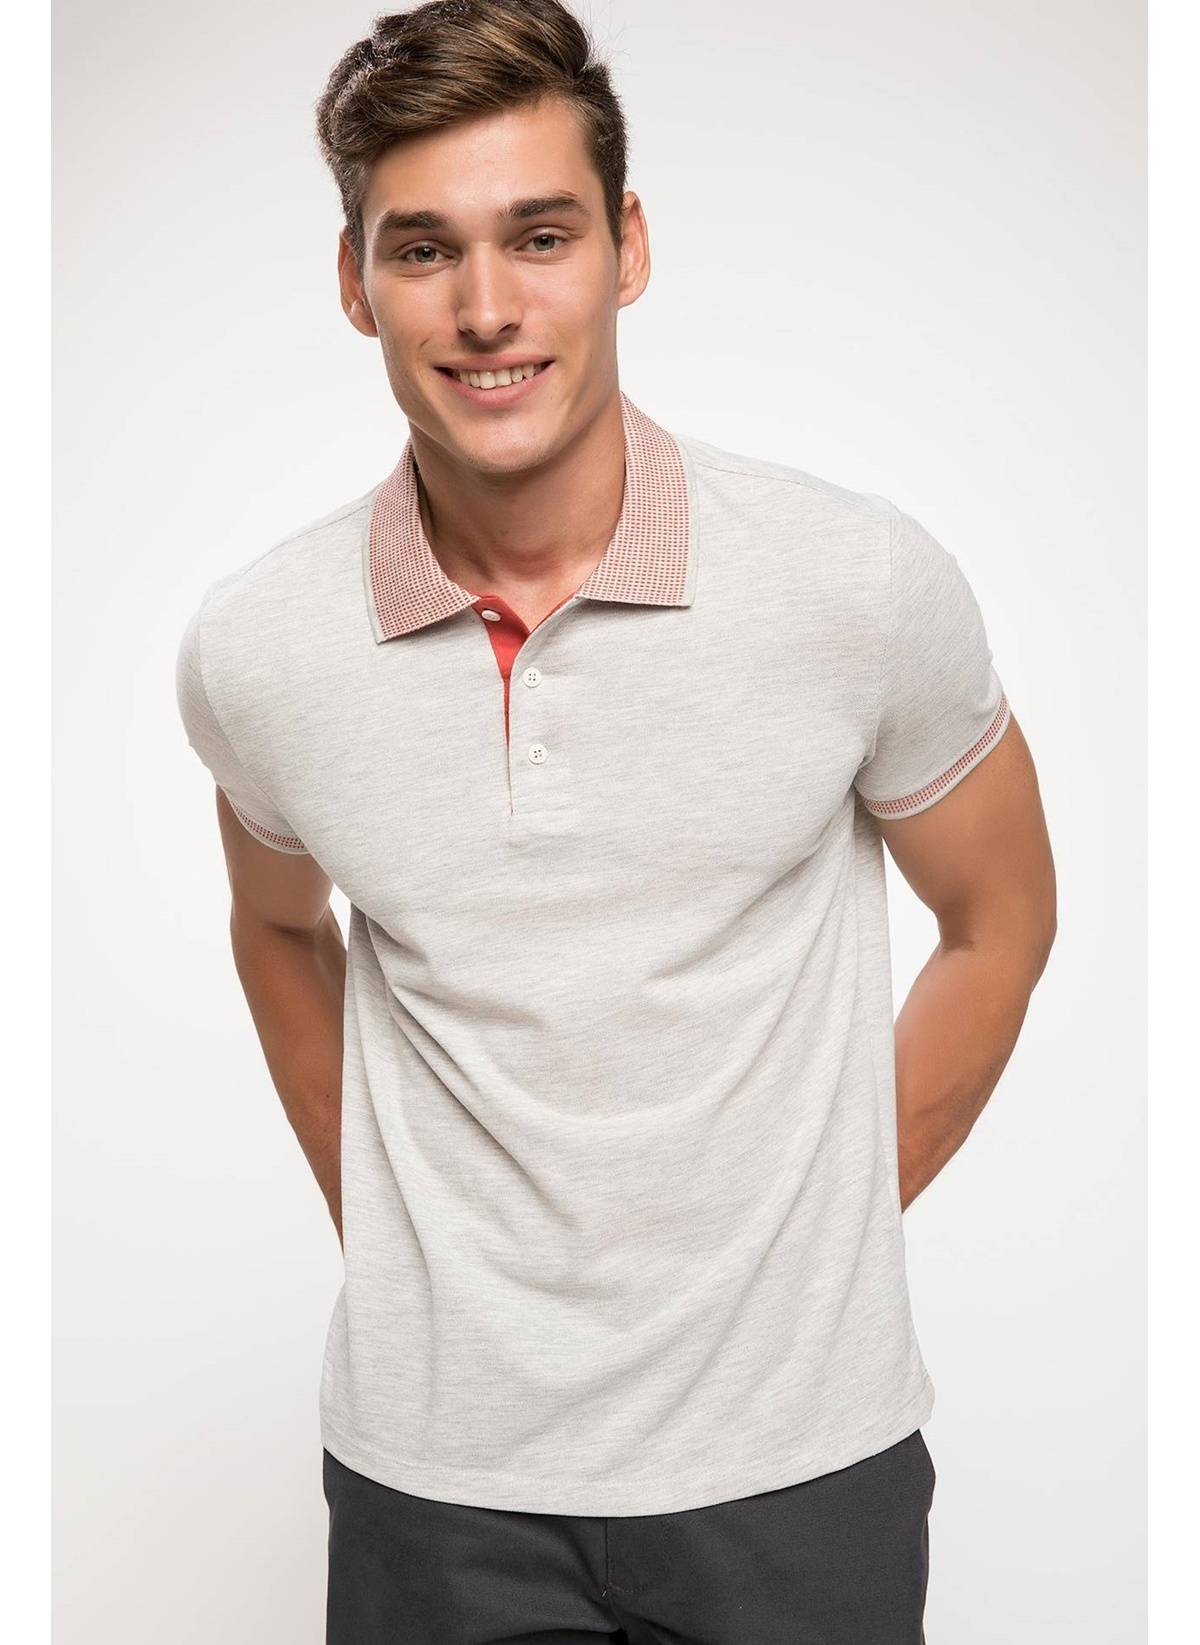 Defacto Trend Slim Fit Polo T-shirt J9403az18hsgr333t-shirt – 35.99 TL